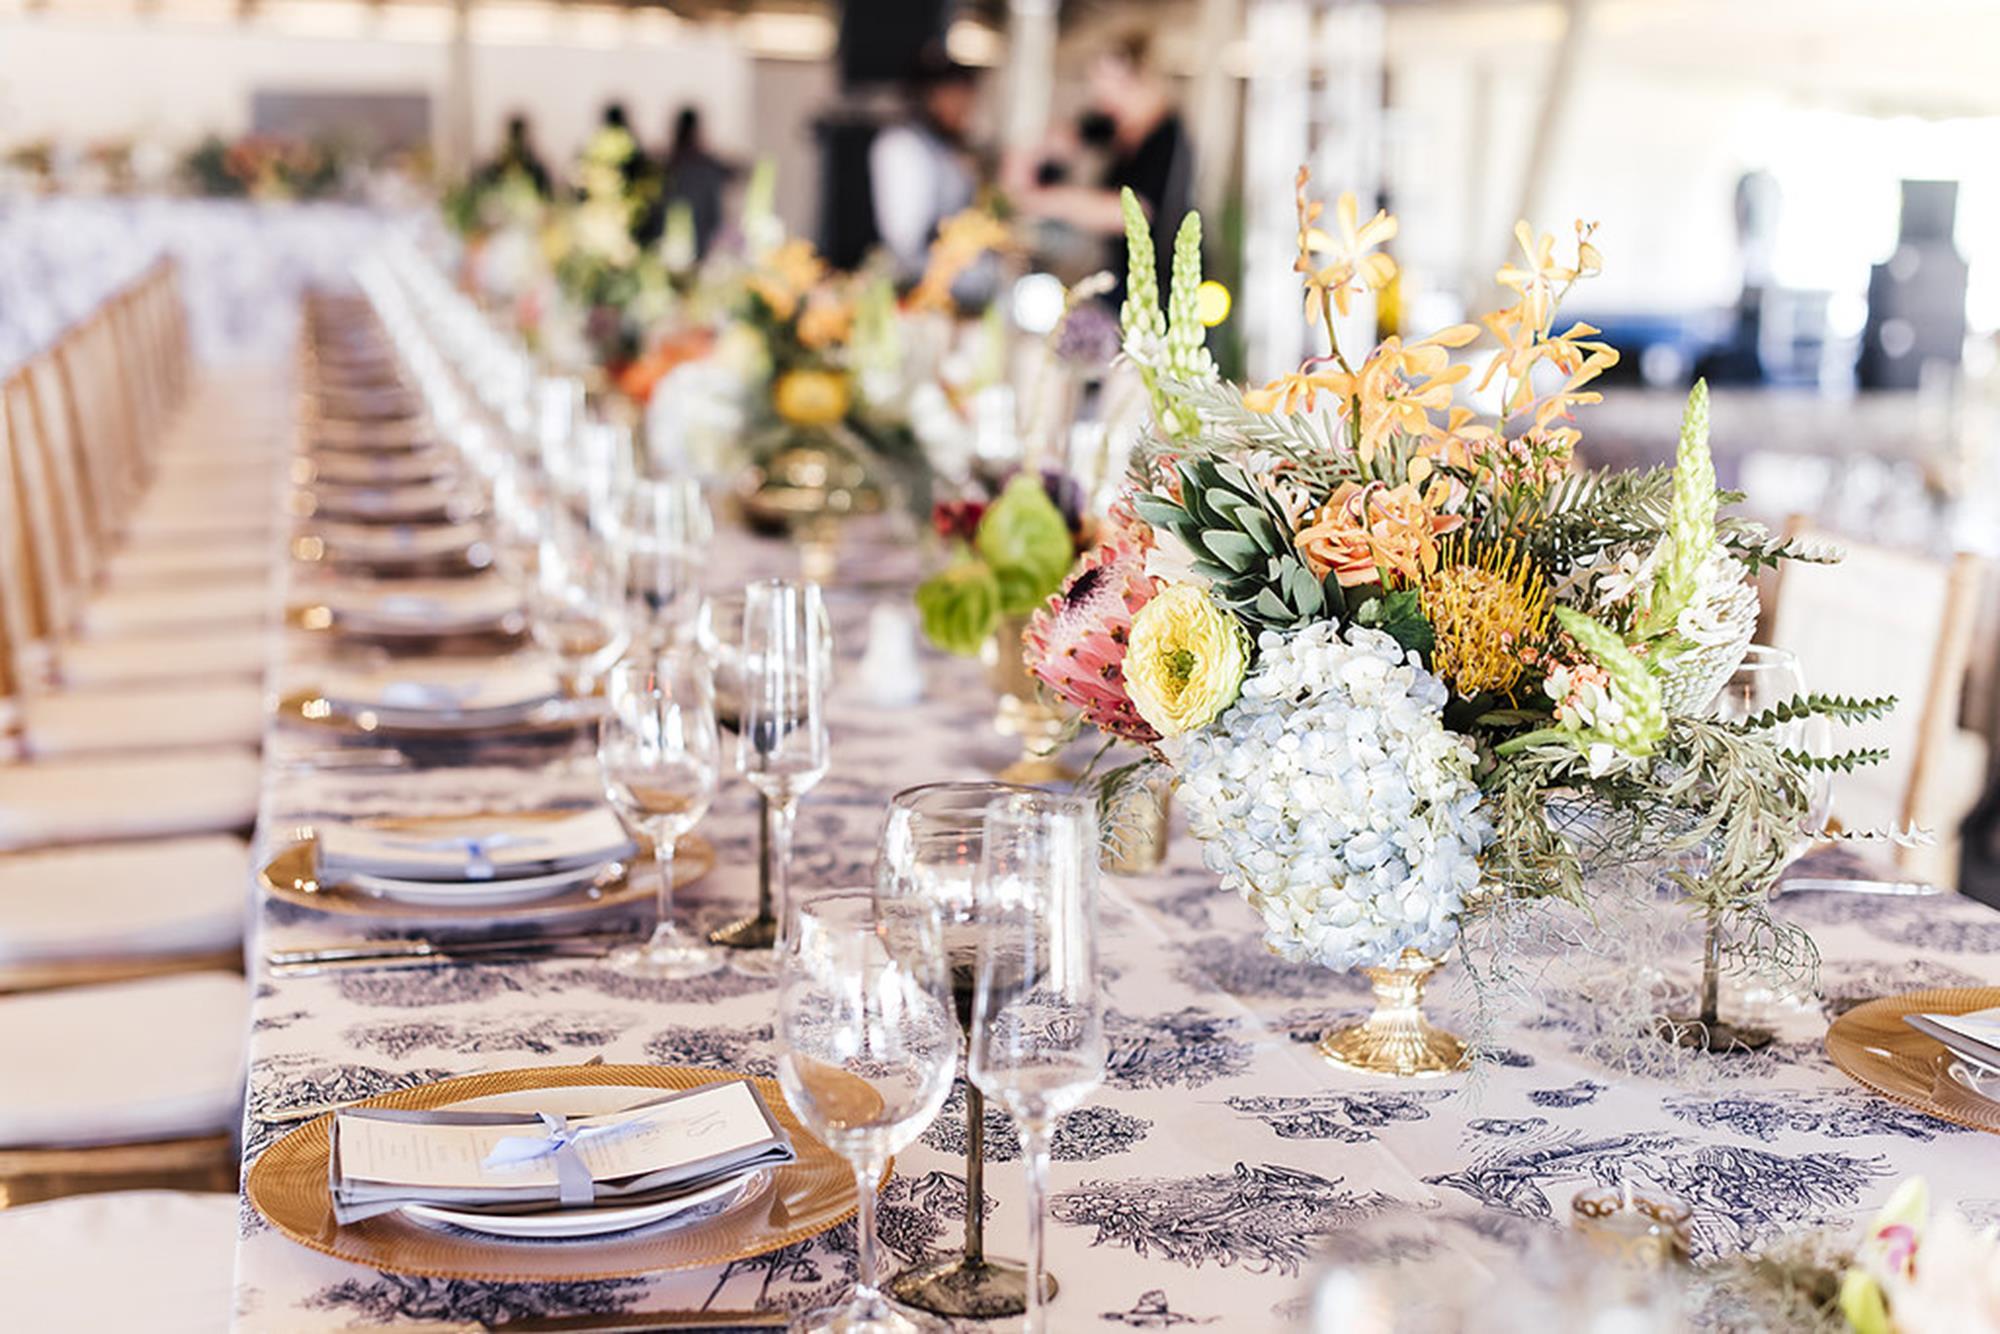 Weddings by Marius Shop, Wedding accessories & services